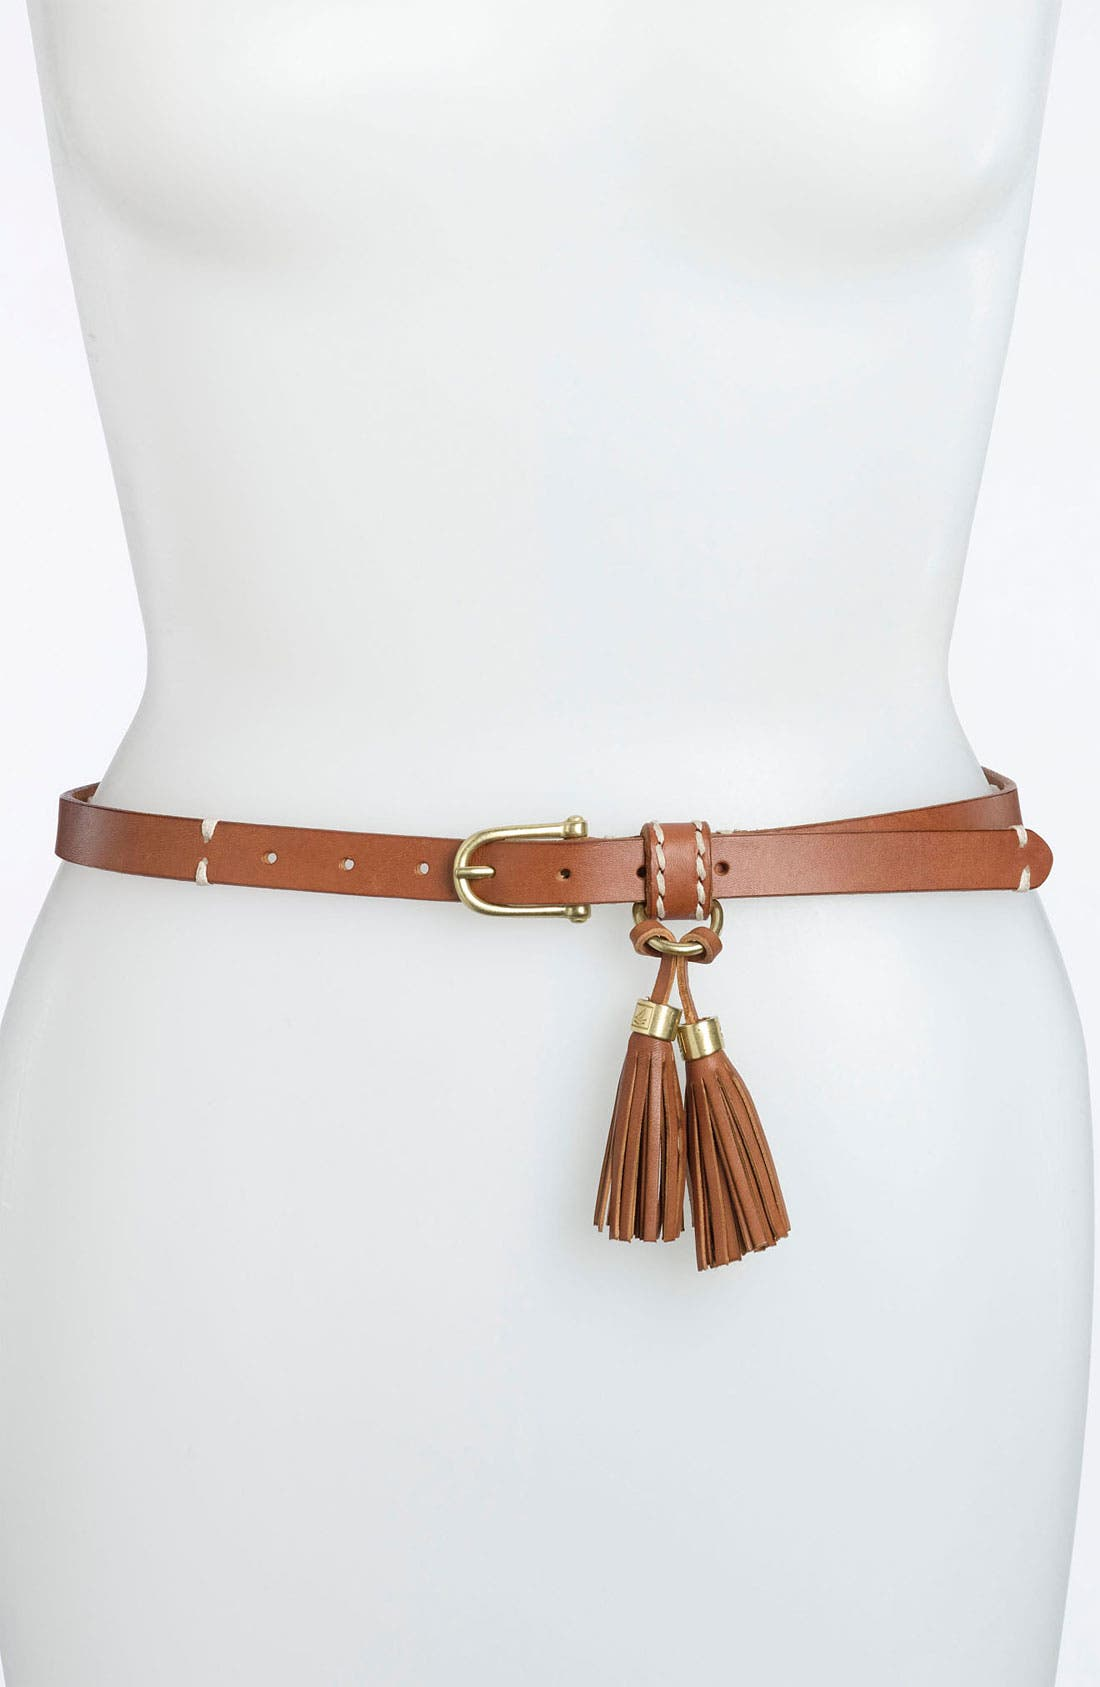 Alternate Image 1 Selected - Sperry Top-Sider® Leather Belt